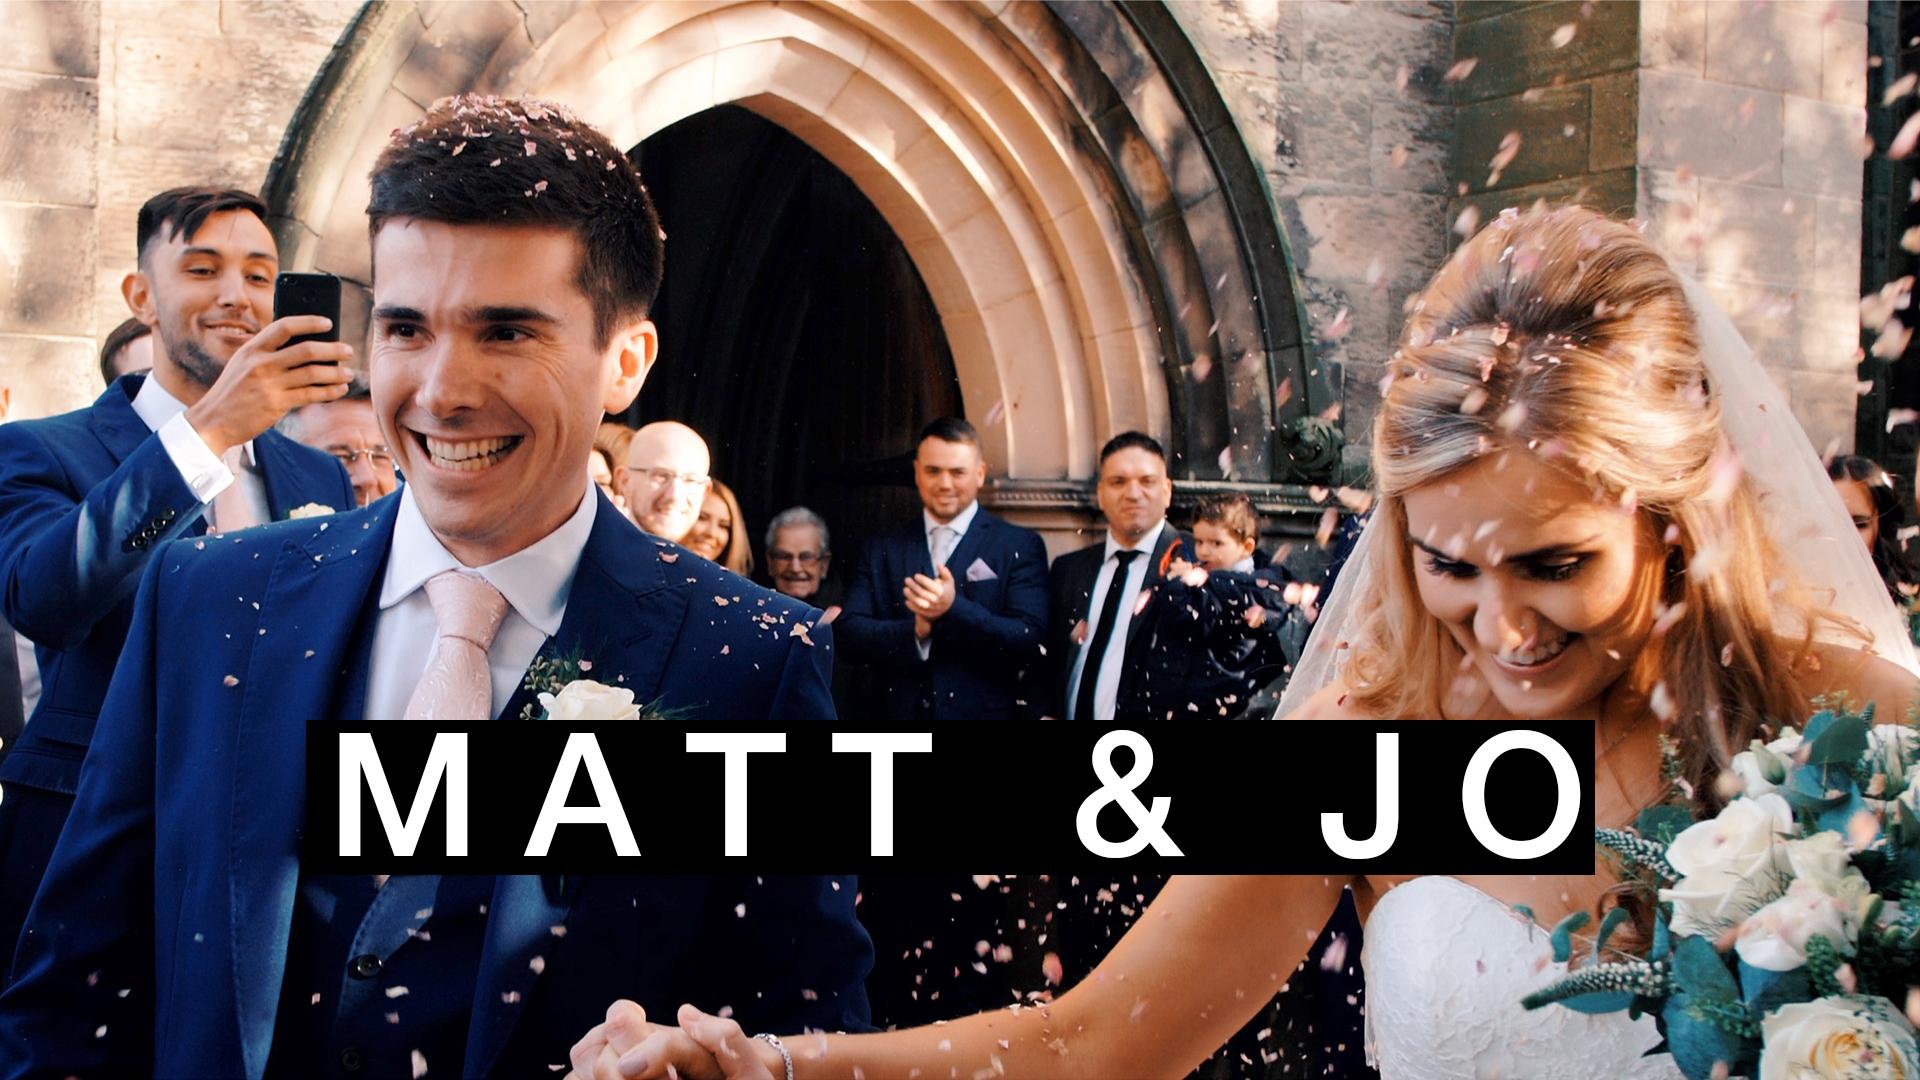 Matt + Jo's Wedding Short Film at the Titanic Hotel Liverpool